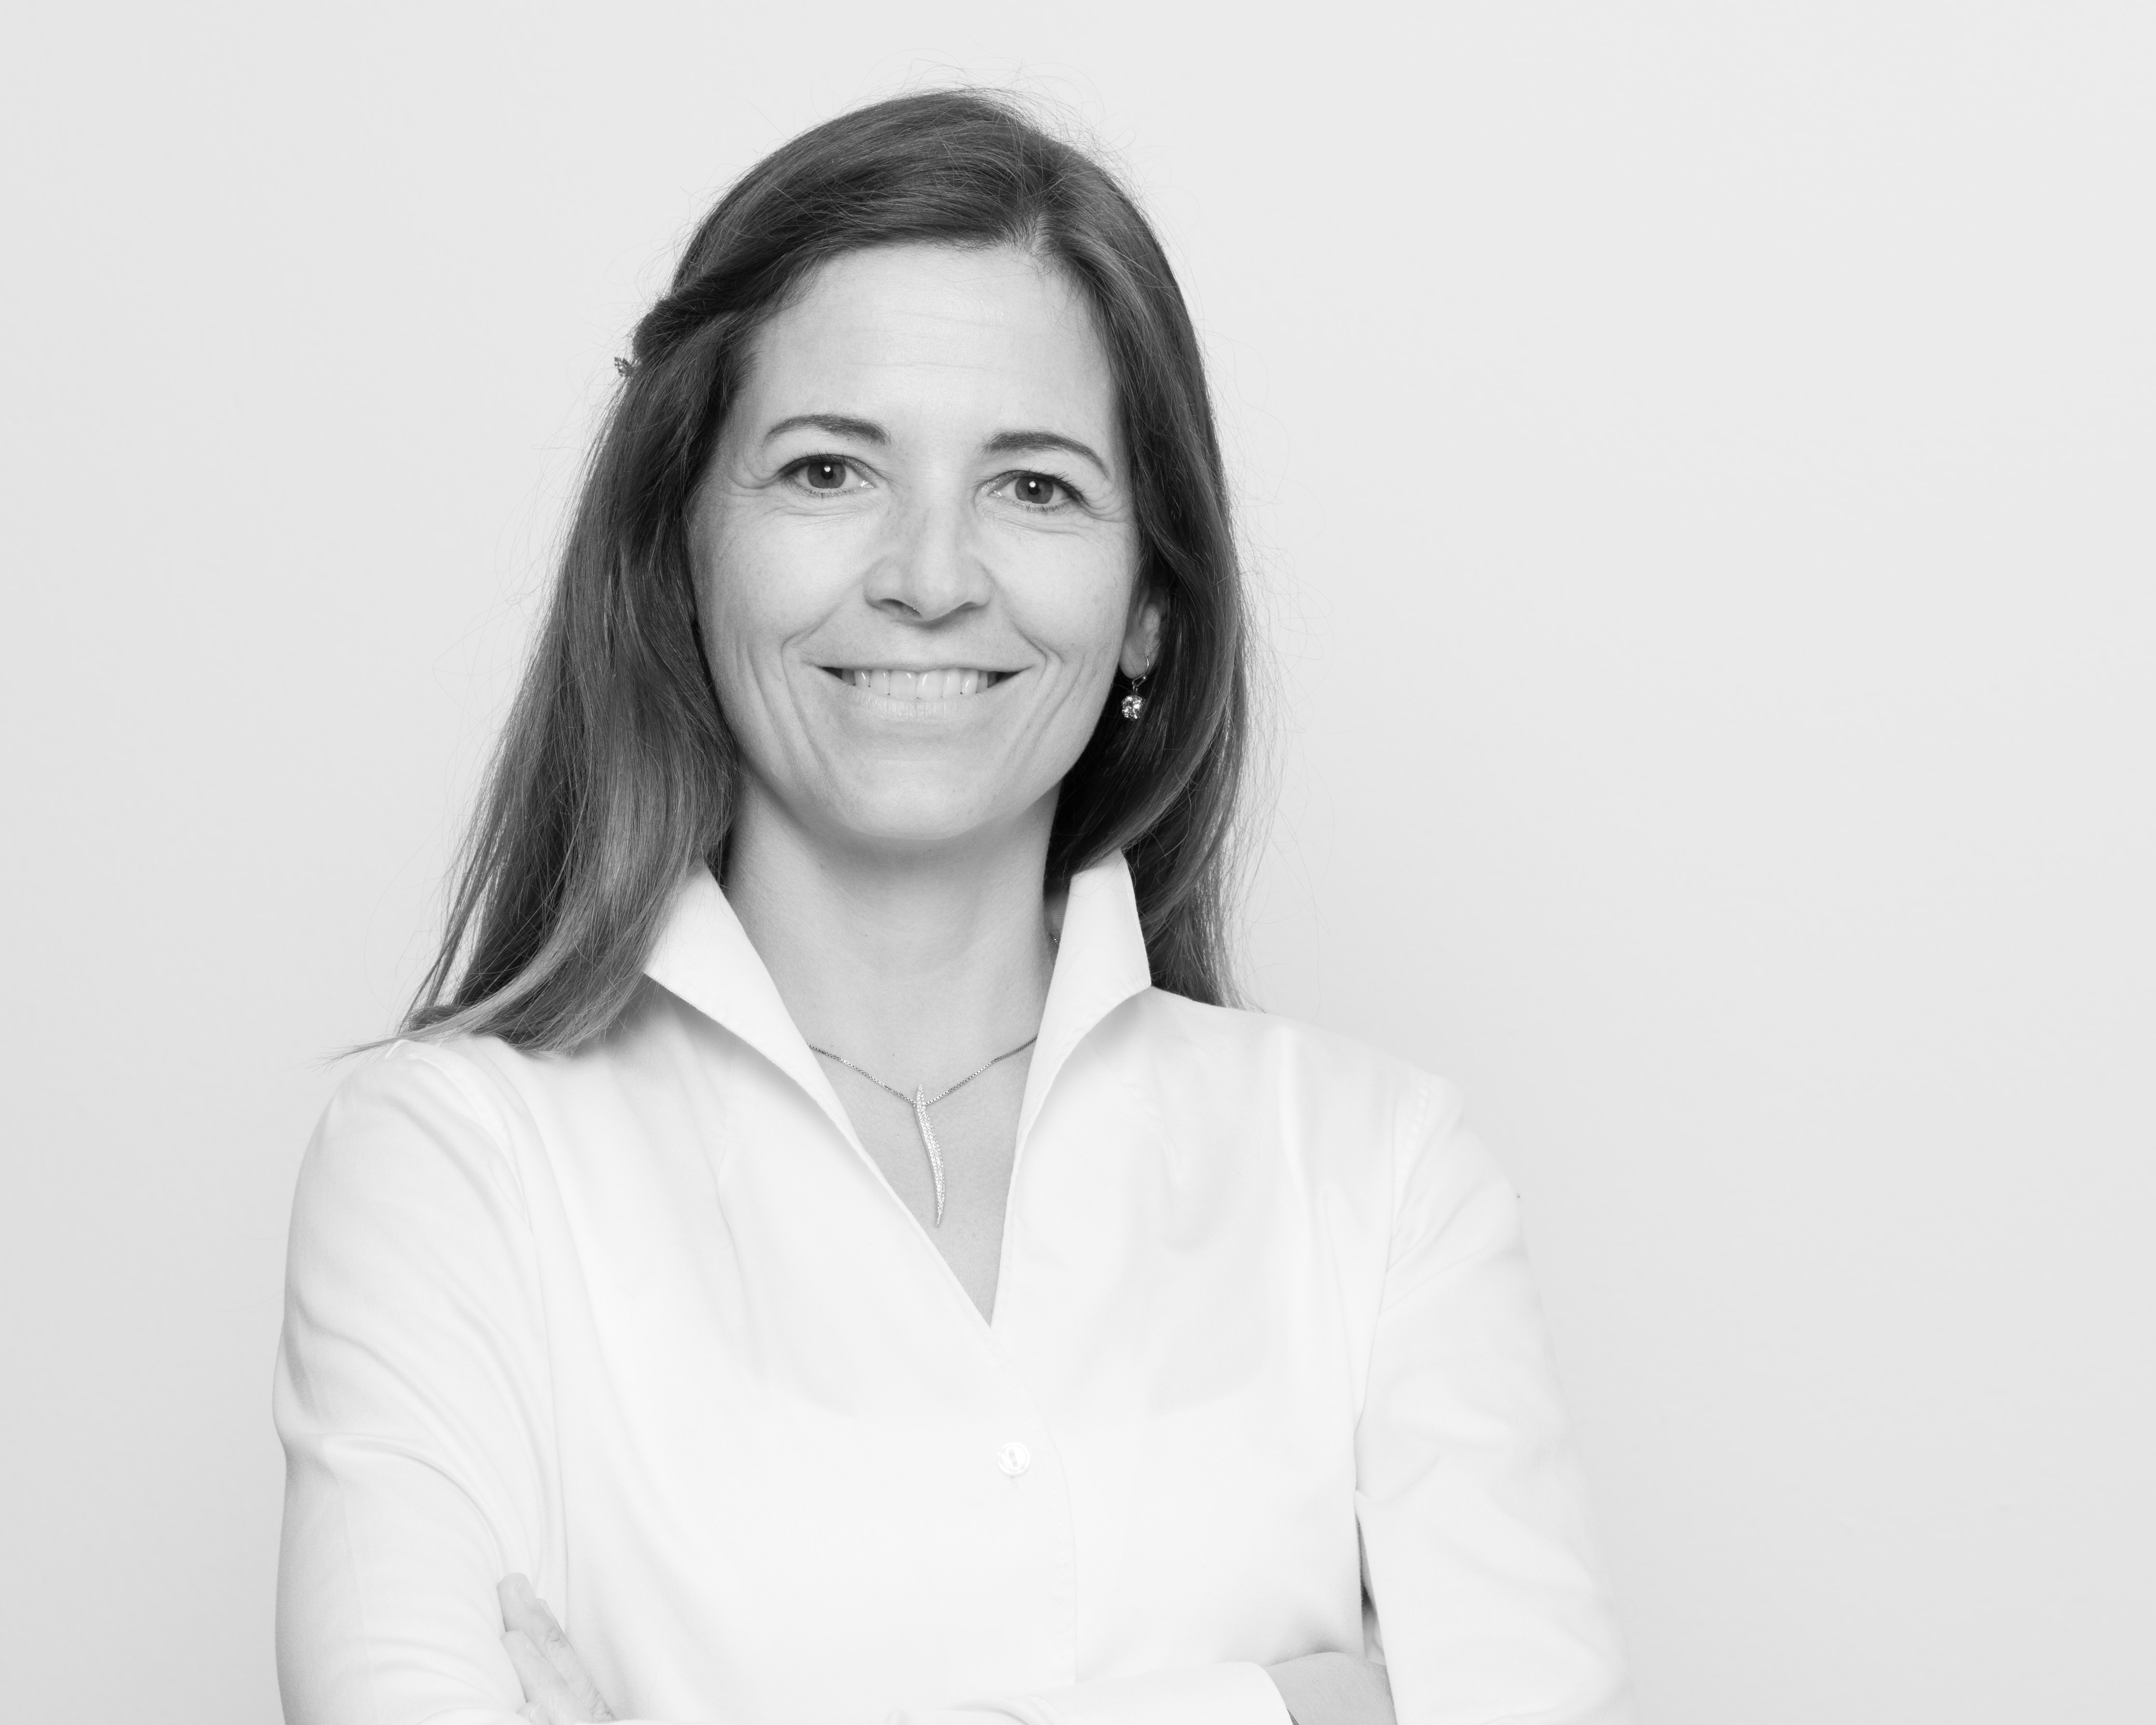 Brigitte Kreuzer